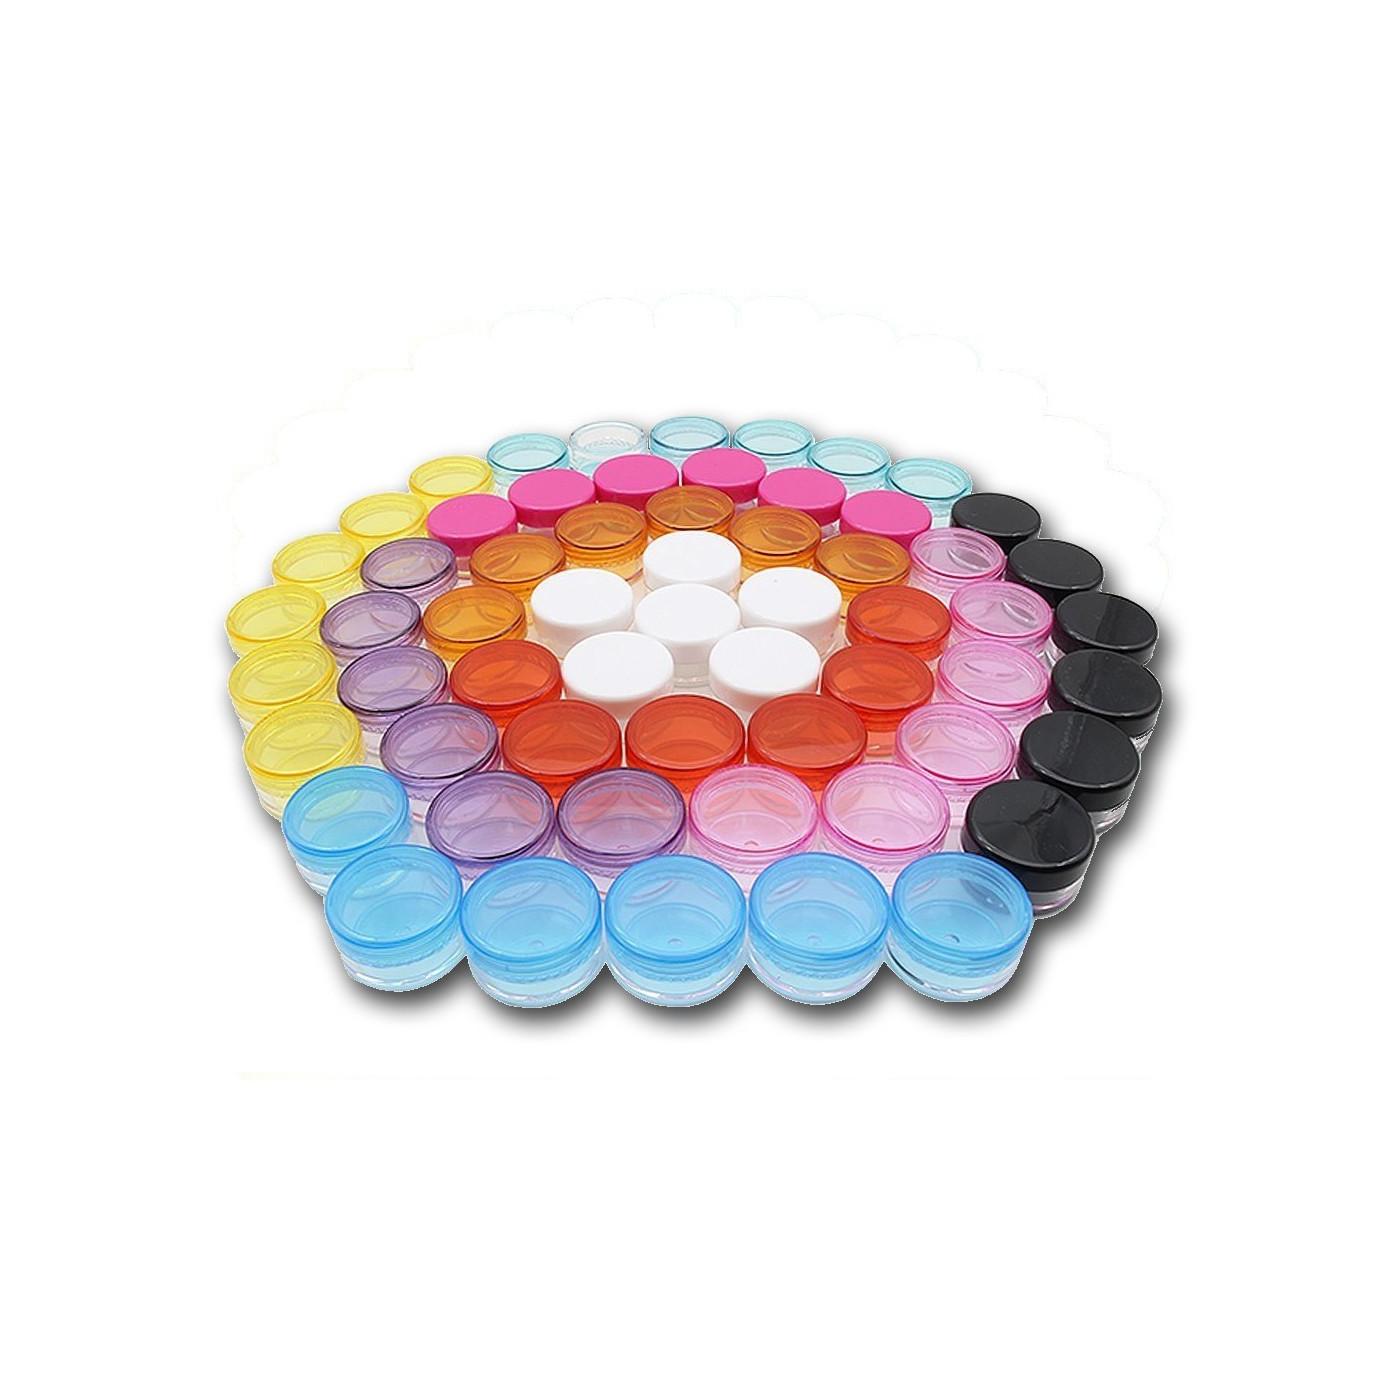 Set of 80 plastic jars (3 ml) with colored screw caps